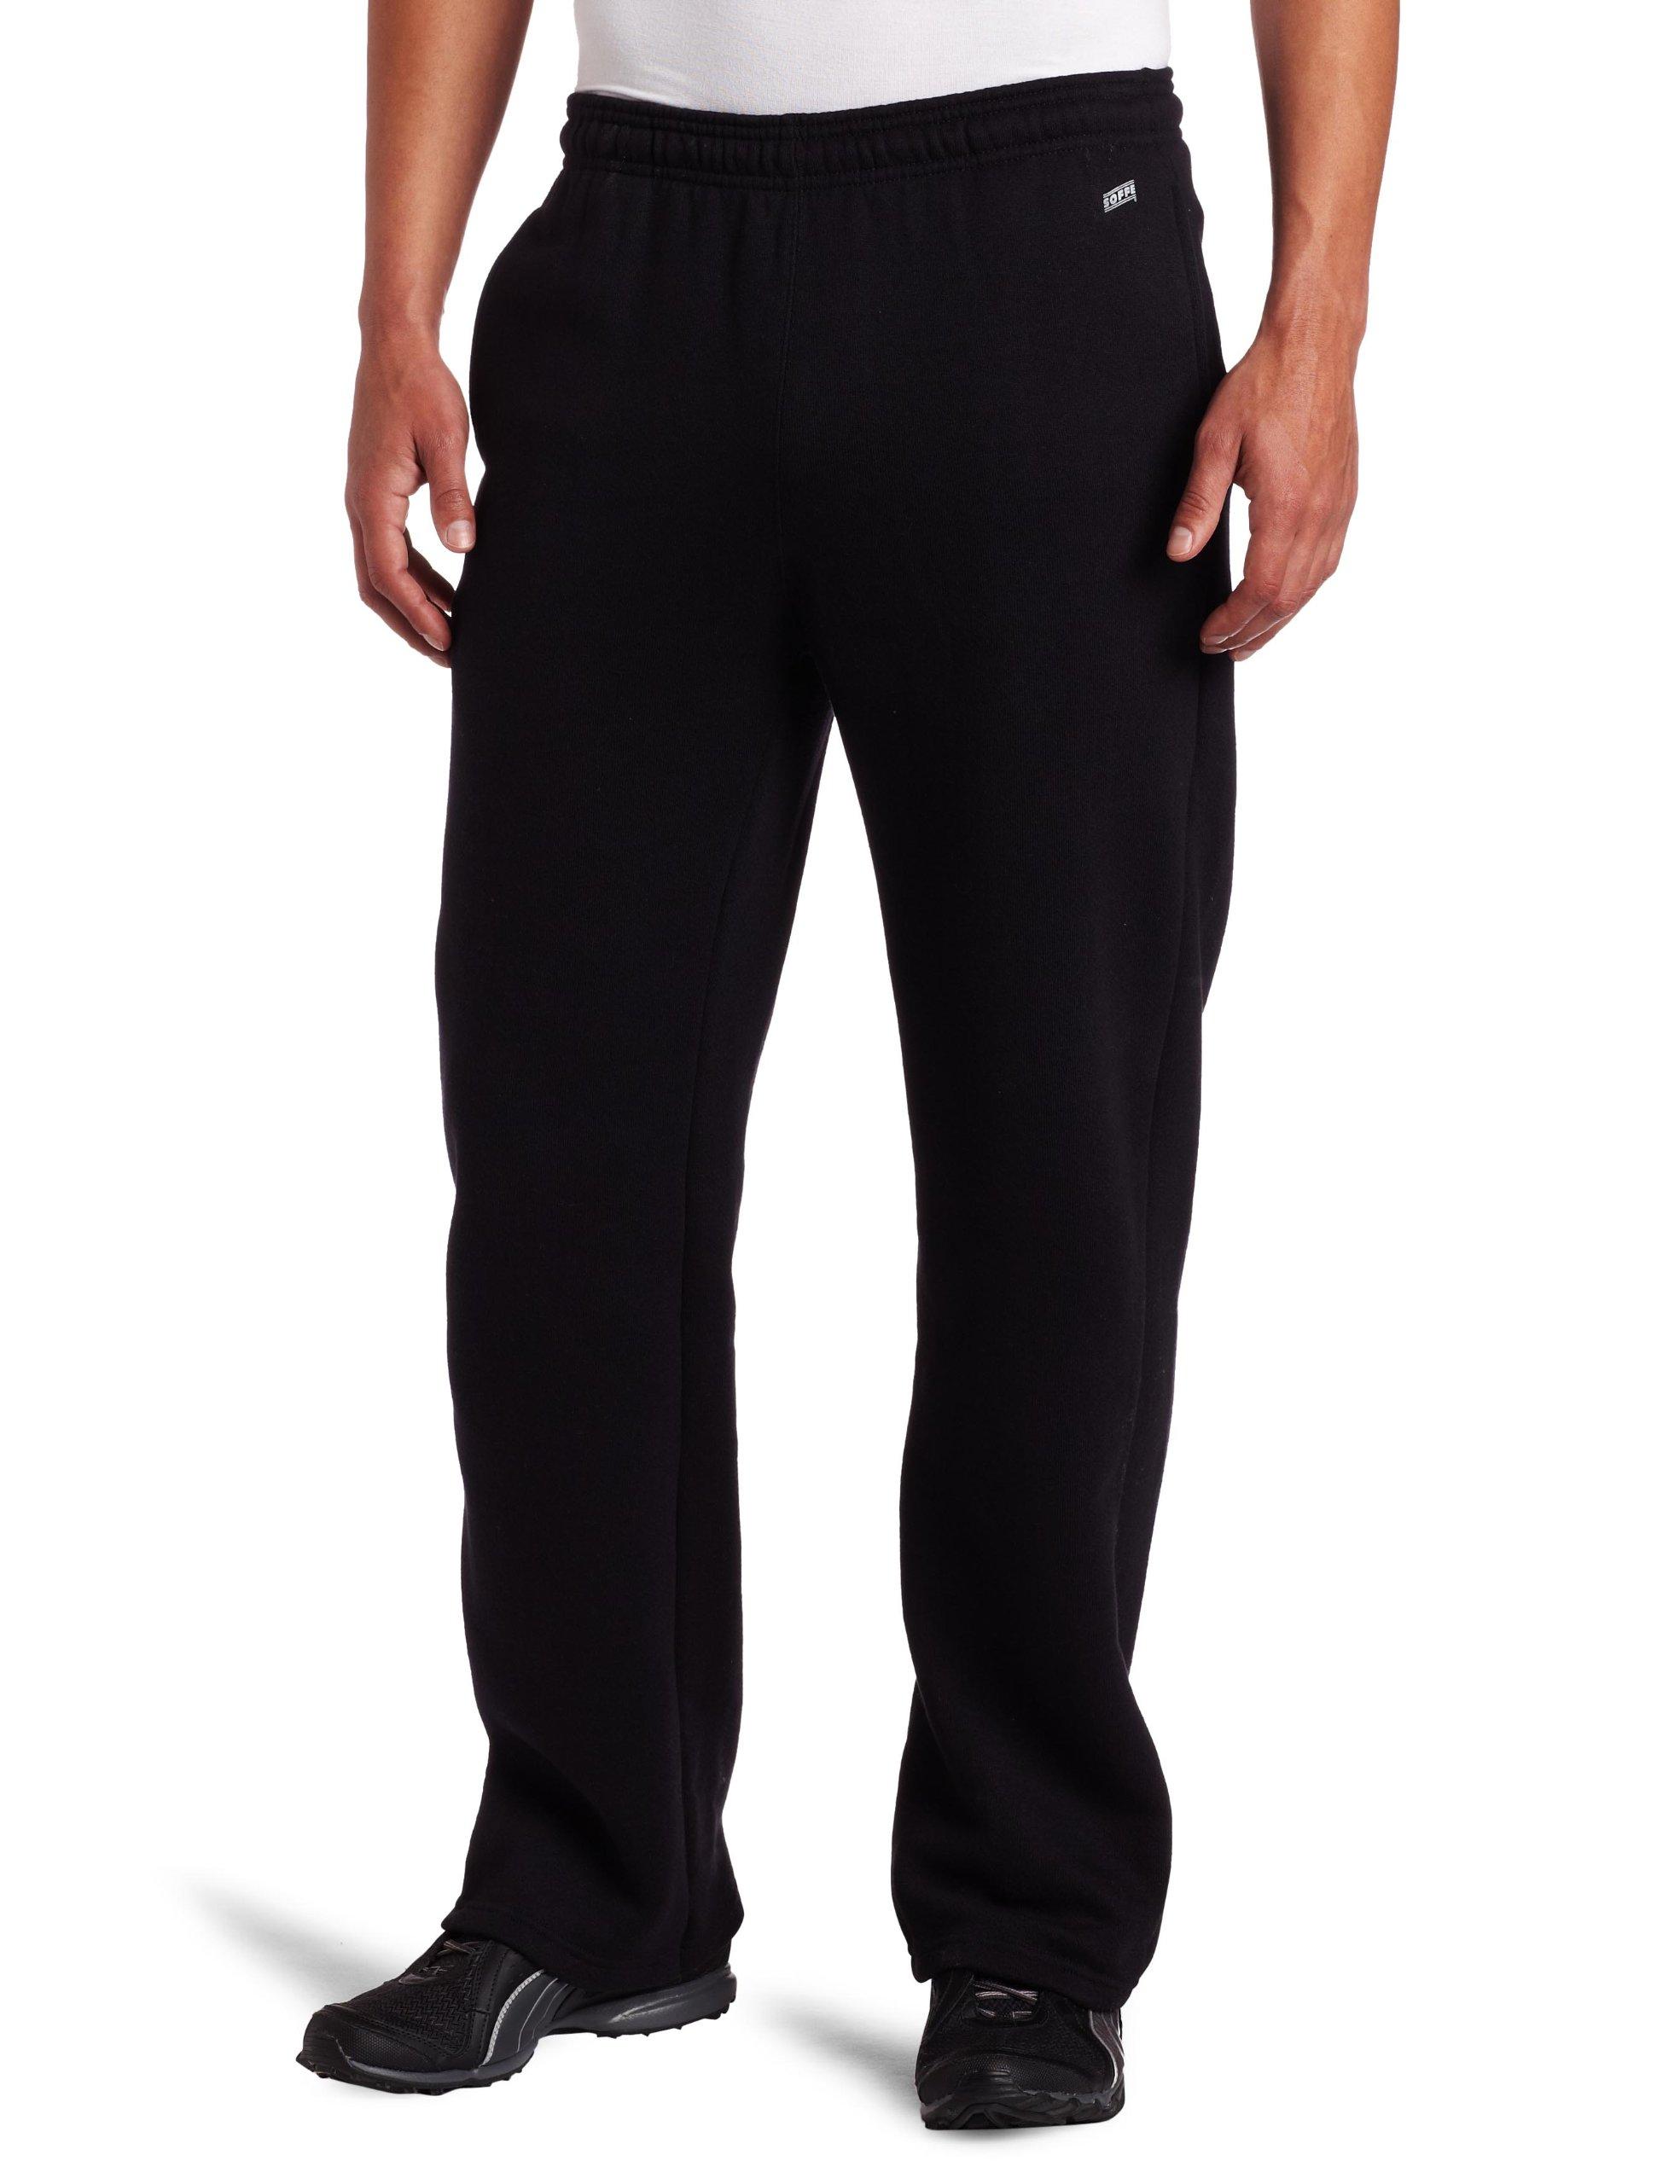 Soffe Men's Training Fleece Pocket Pant Black Small